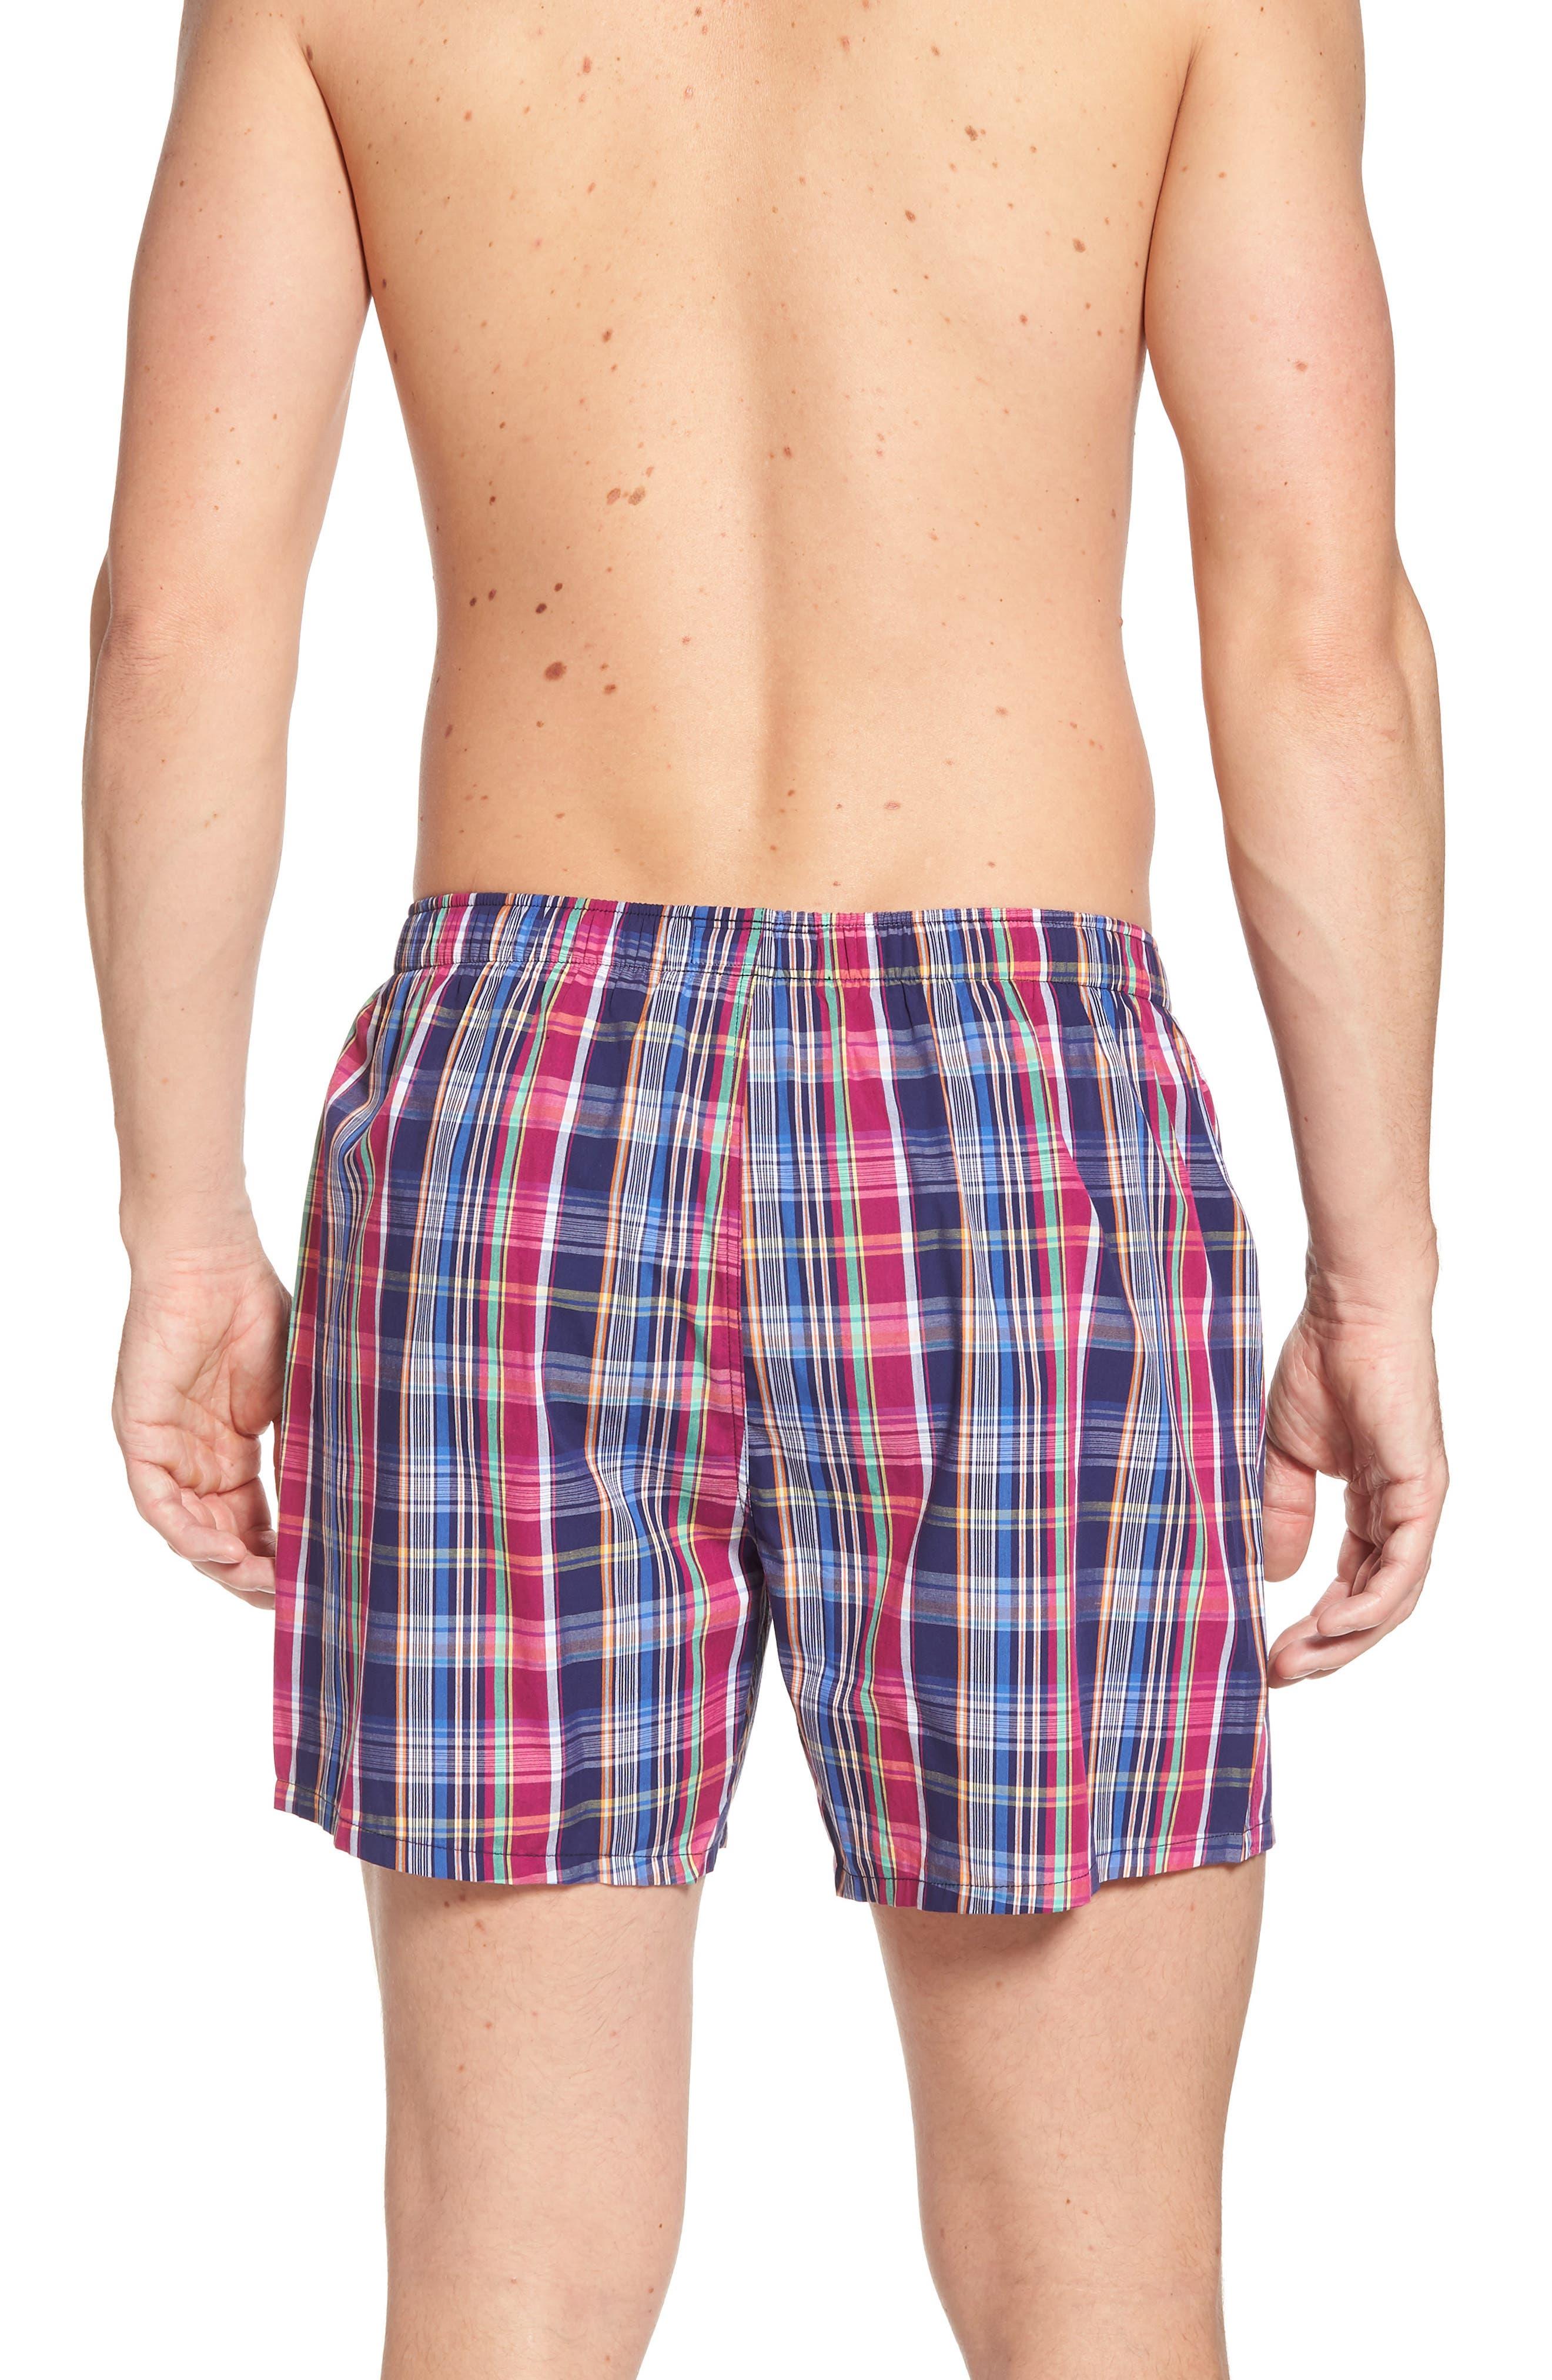 Woven Cotton Boxers,                             Alternate thumbnail 2, color,                             Collin Plaid/ Bright Pink